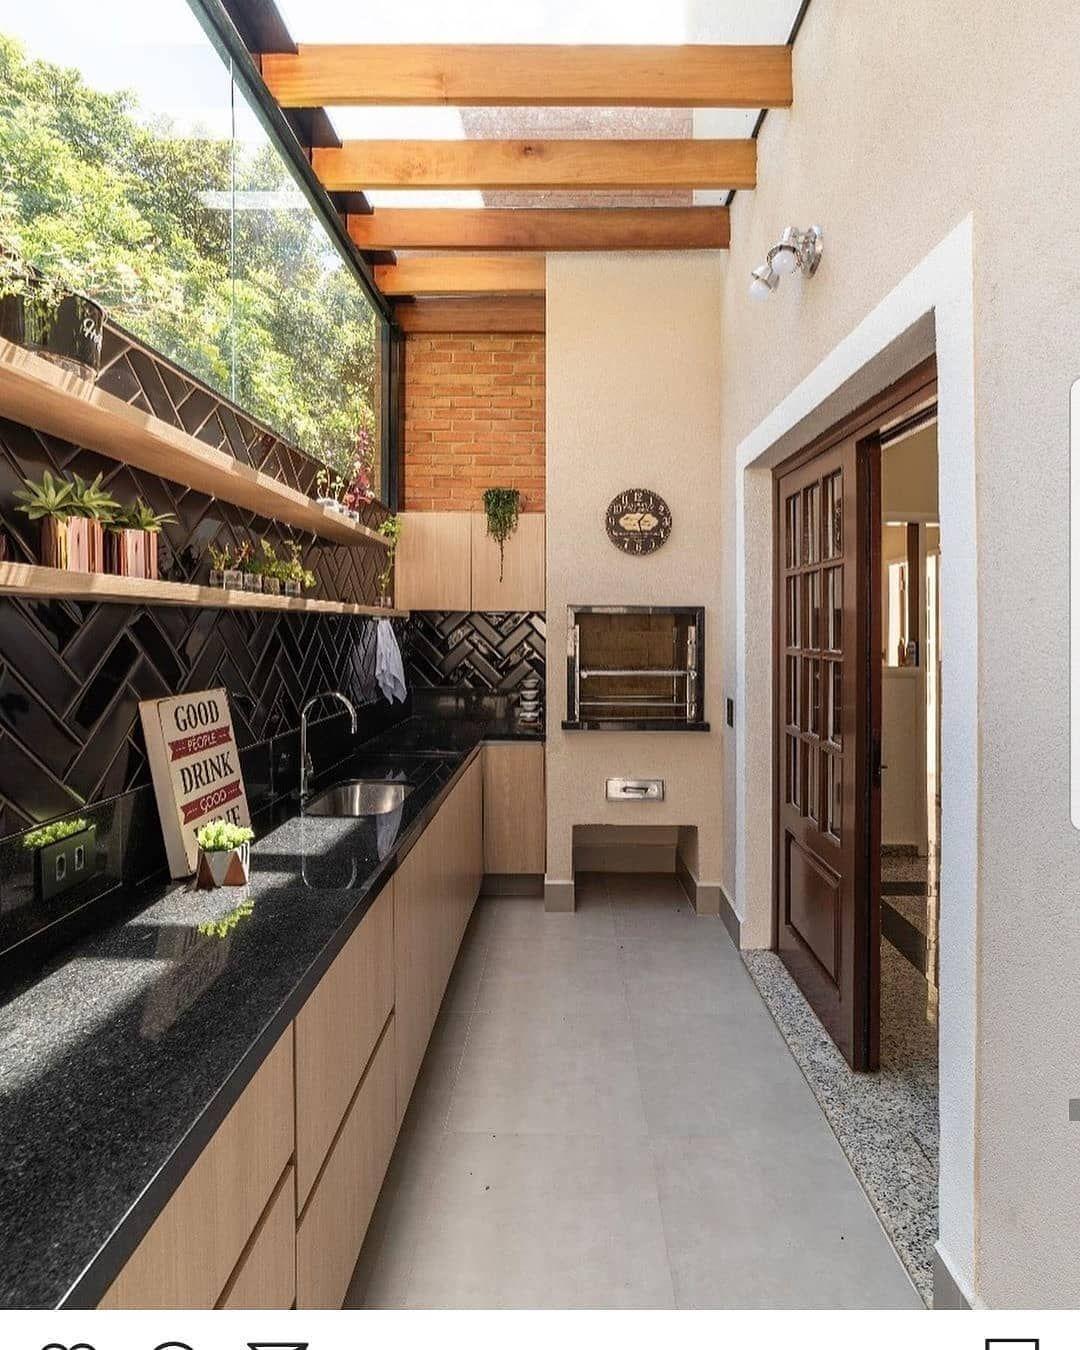 Hgtv shares designers' tips for kitchen design under $500. Before&AfterPics on Twitter | Exteriores de casas, Diseño ...